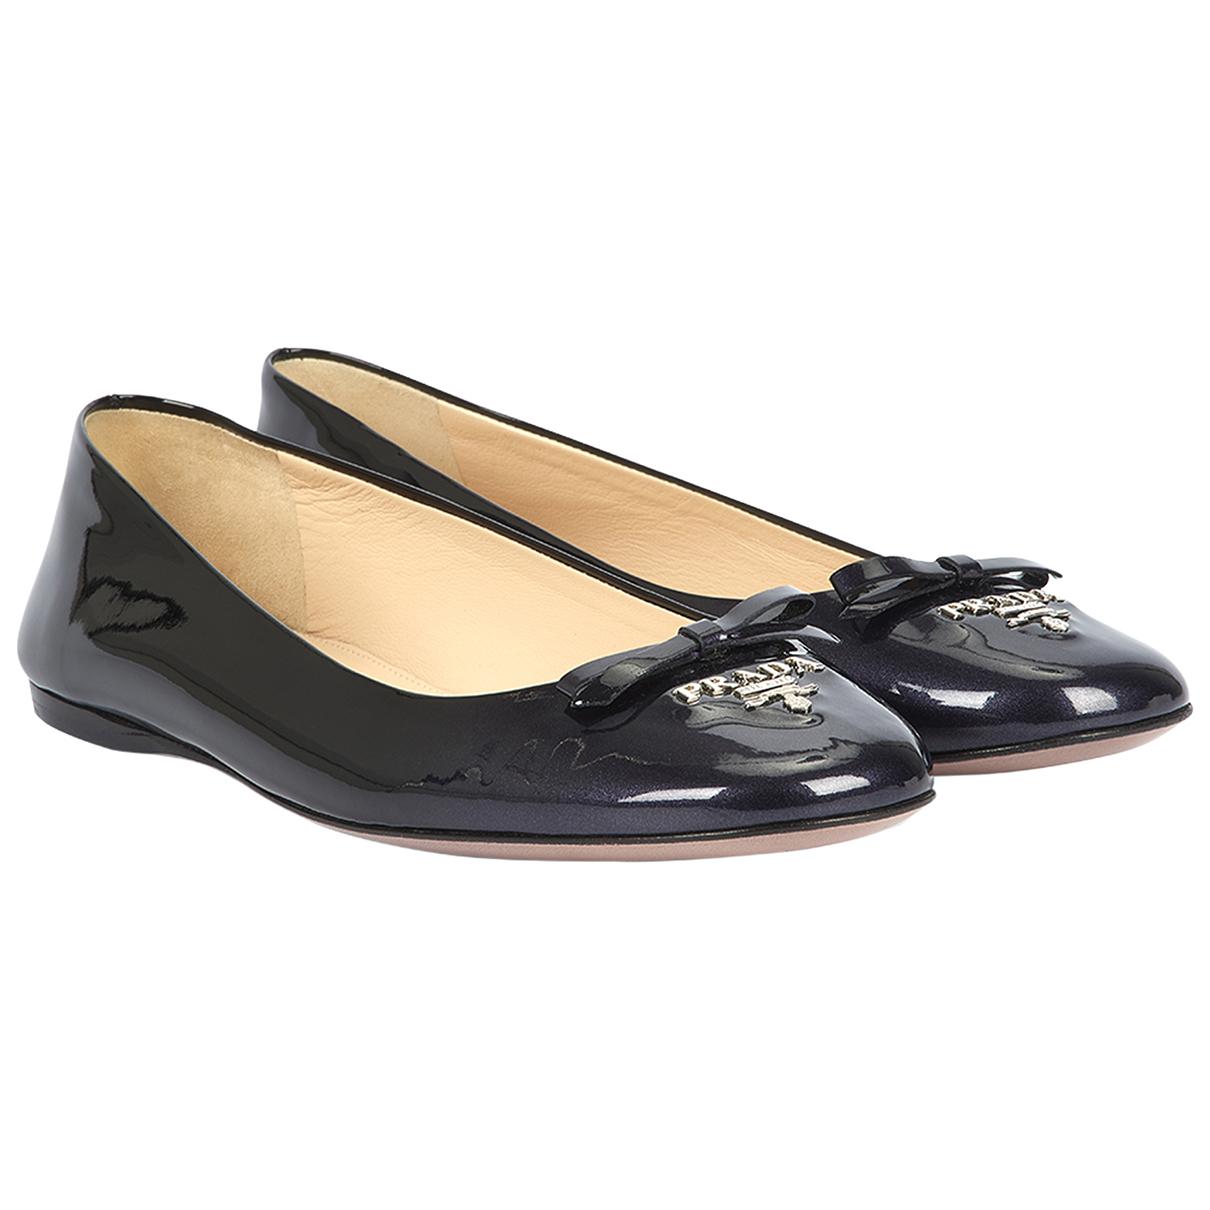 Prada N Navy Patent leather Ballet flats for Women 4.5 UK